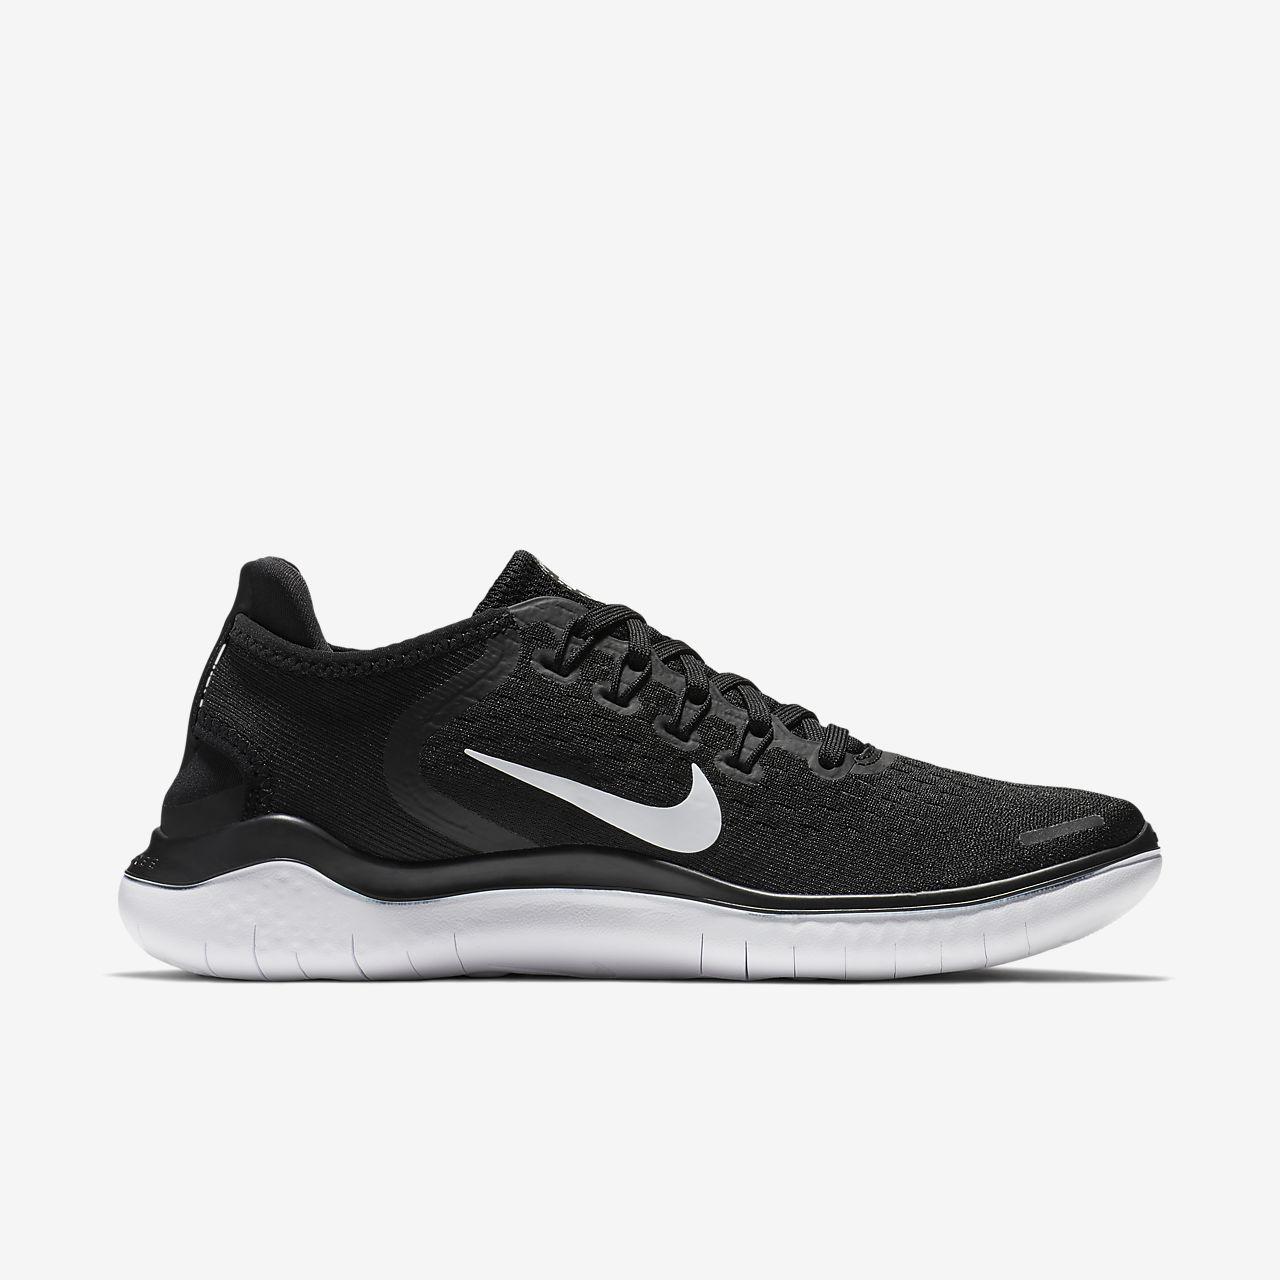 meilleur site web 7fb1b 4c1b5 Nike Free RN 2018 Women's Running Shoe